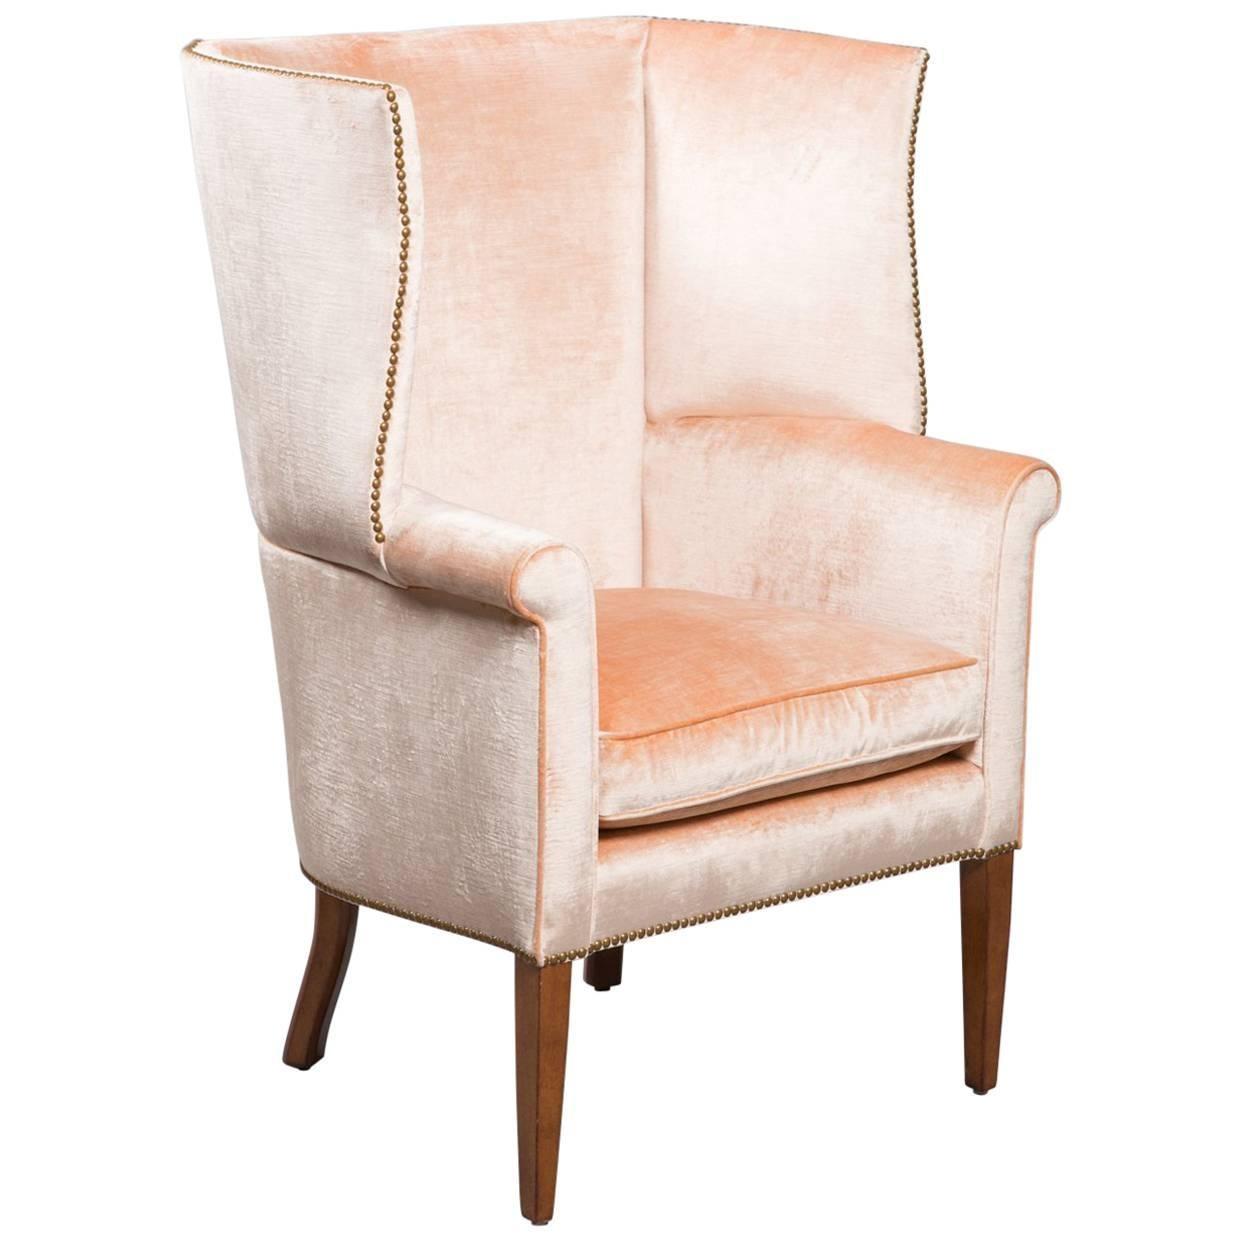 1950s Midcentury Wingback Armchair